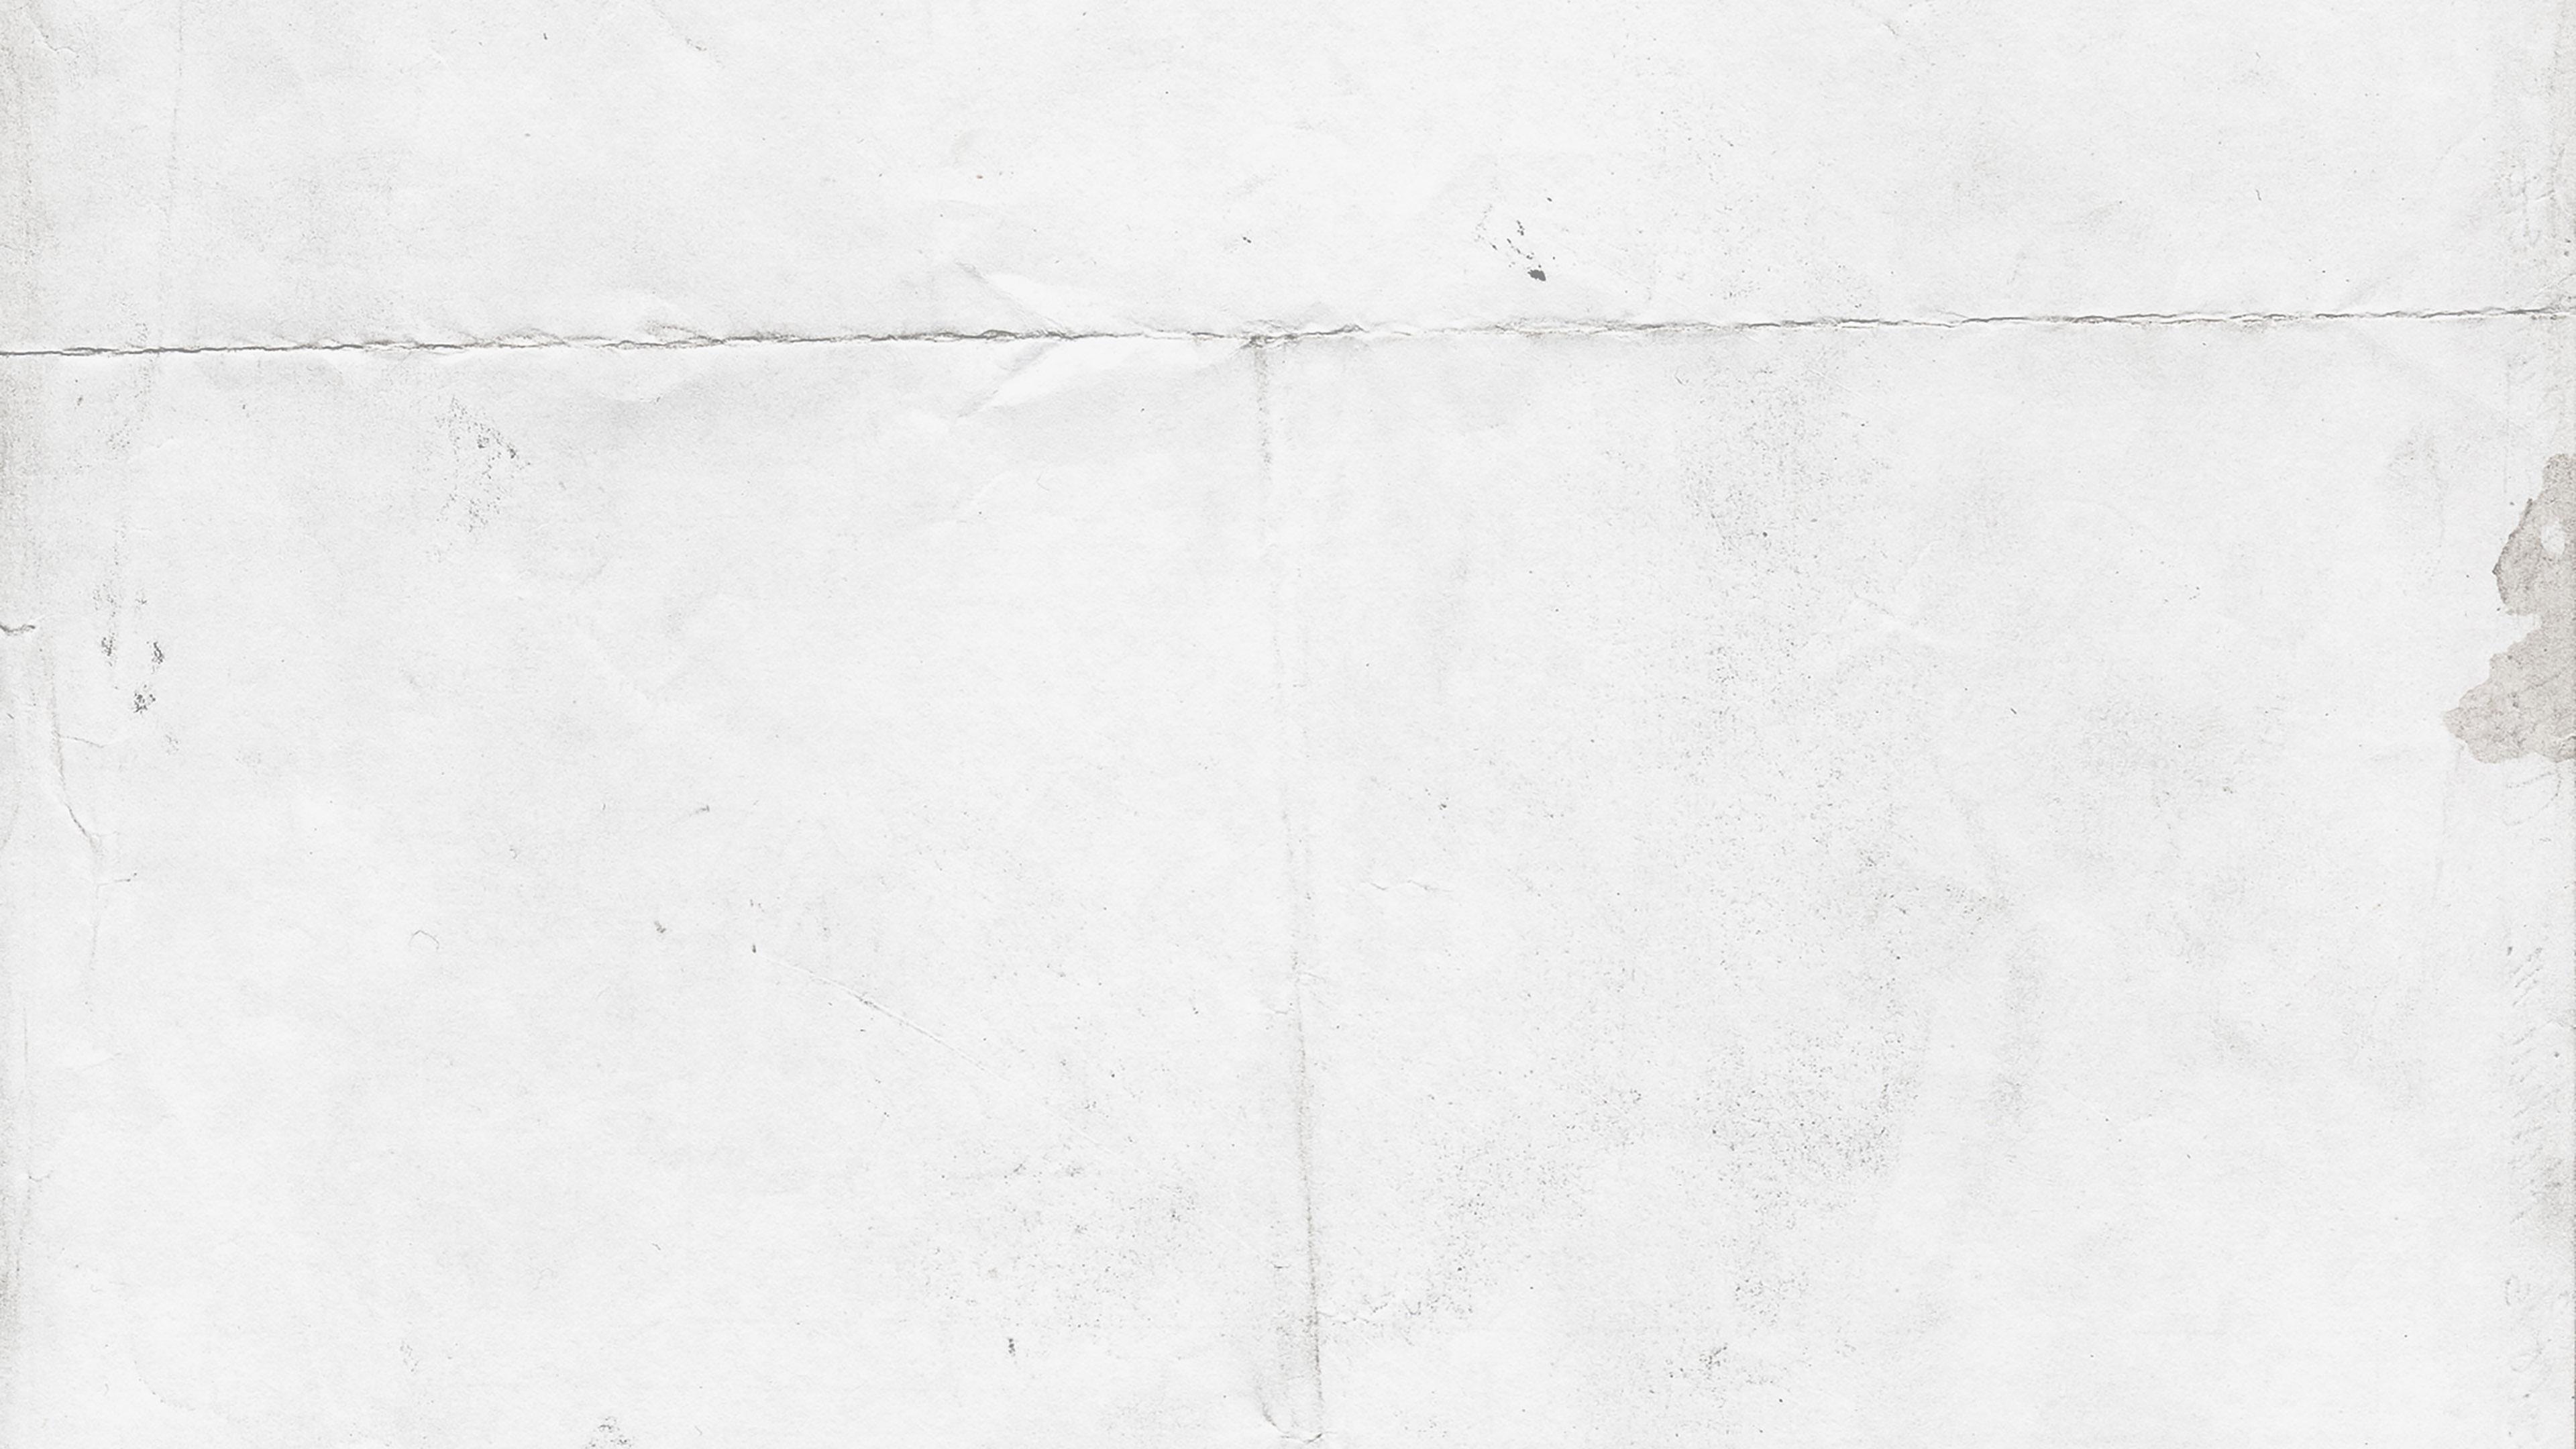 Cute Fall Desktop Wallpaper Ab57 Wallpaper Grunge Paper Texture White Papers Co